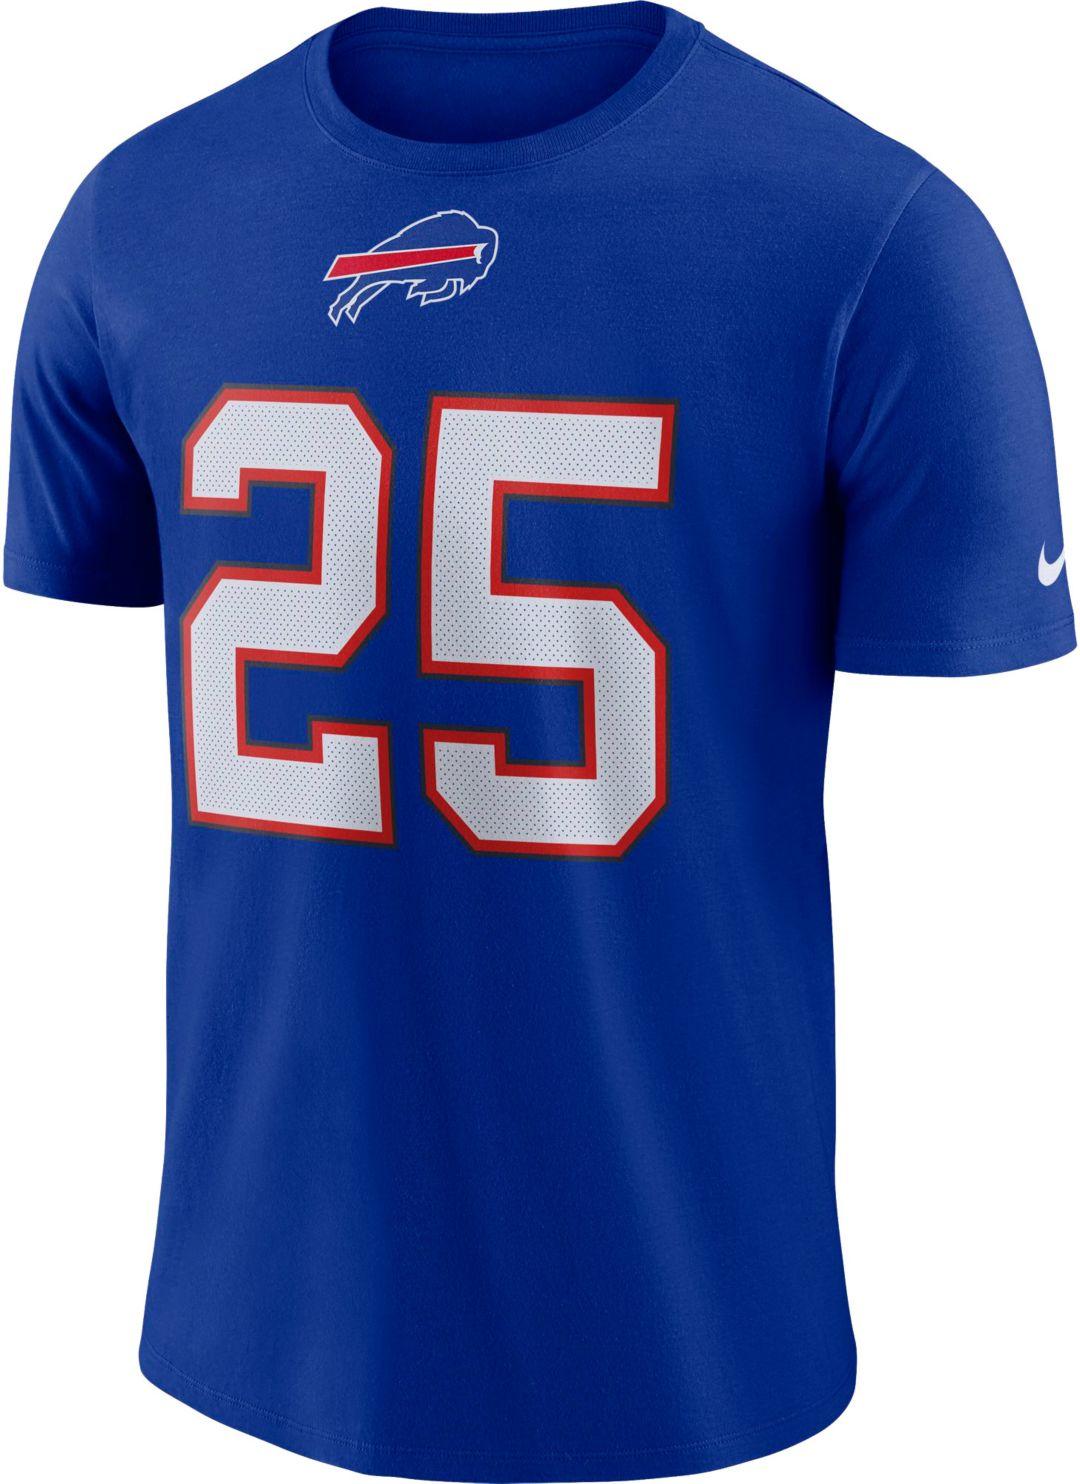 677340d1a7a54 LeSean McCoy #25 Nike Men's Buffalo Bills Pride Royal T-Shirt